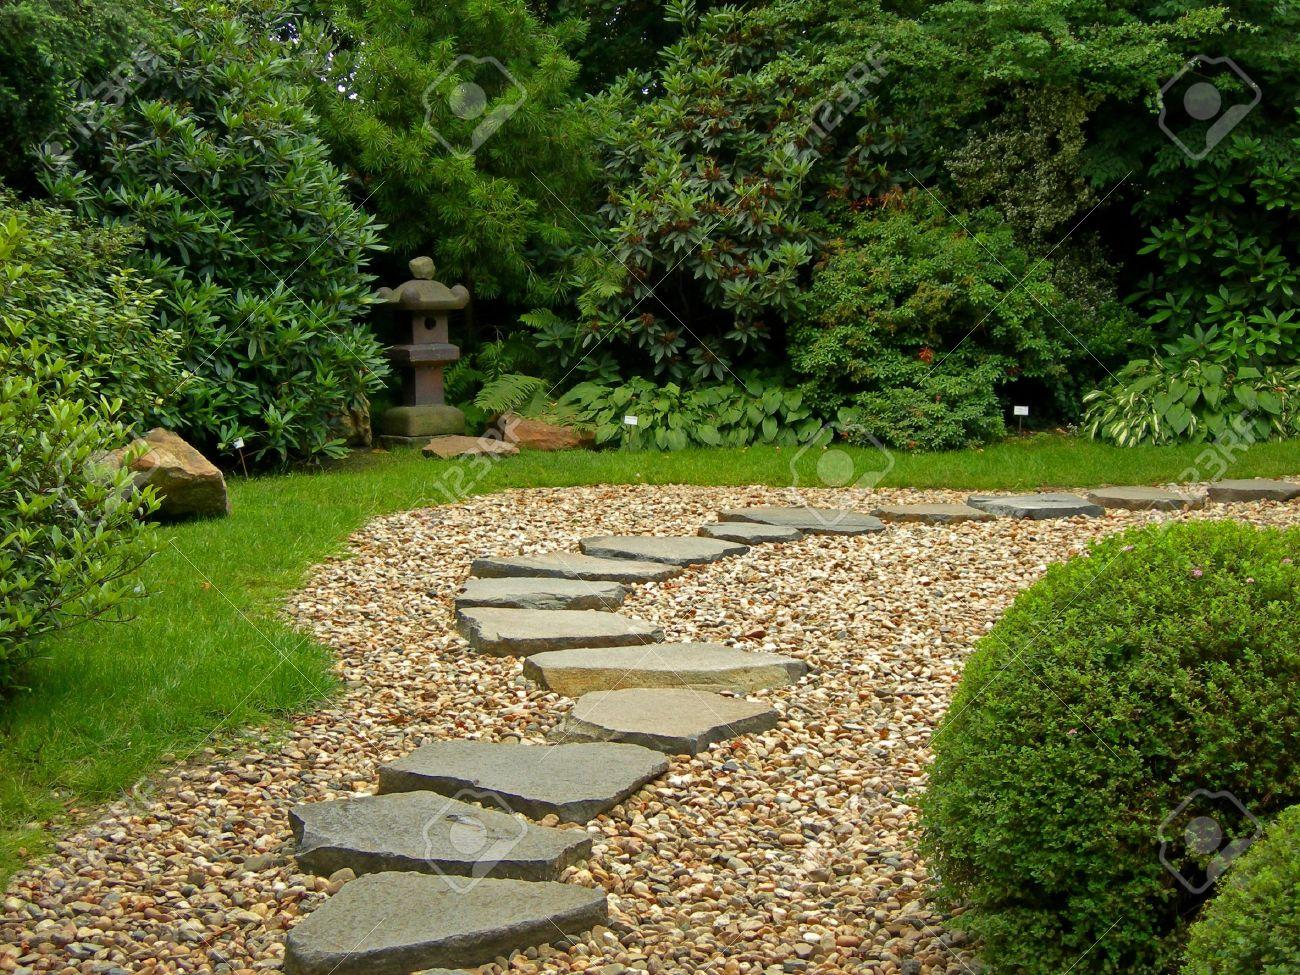 jardines japoneses camino del zen en un jardn botnico japons en praga